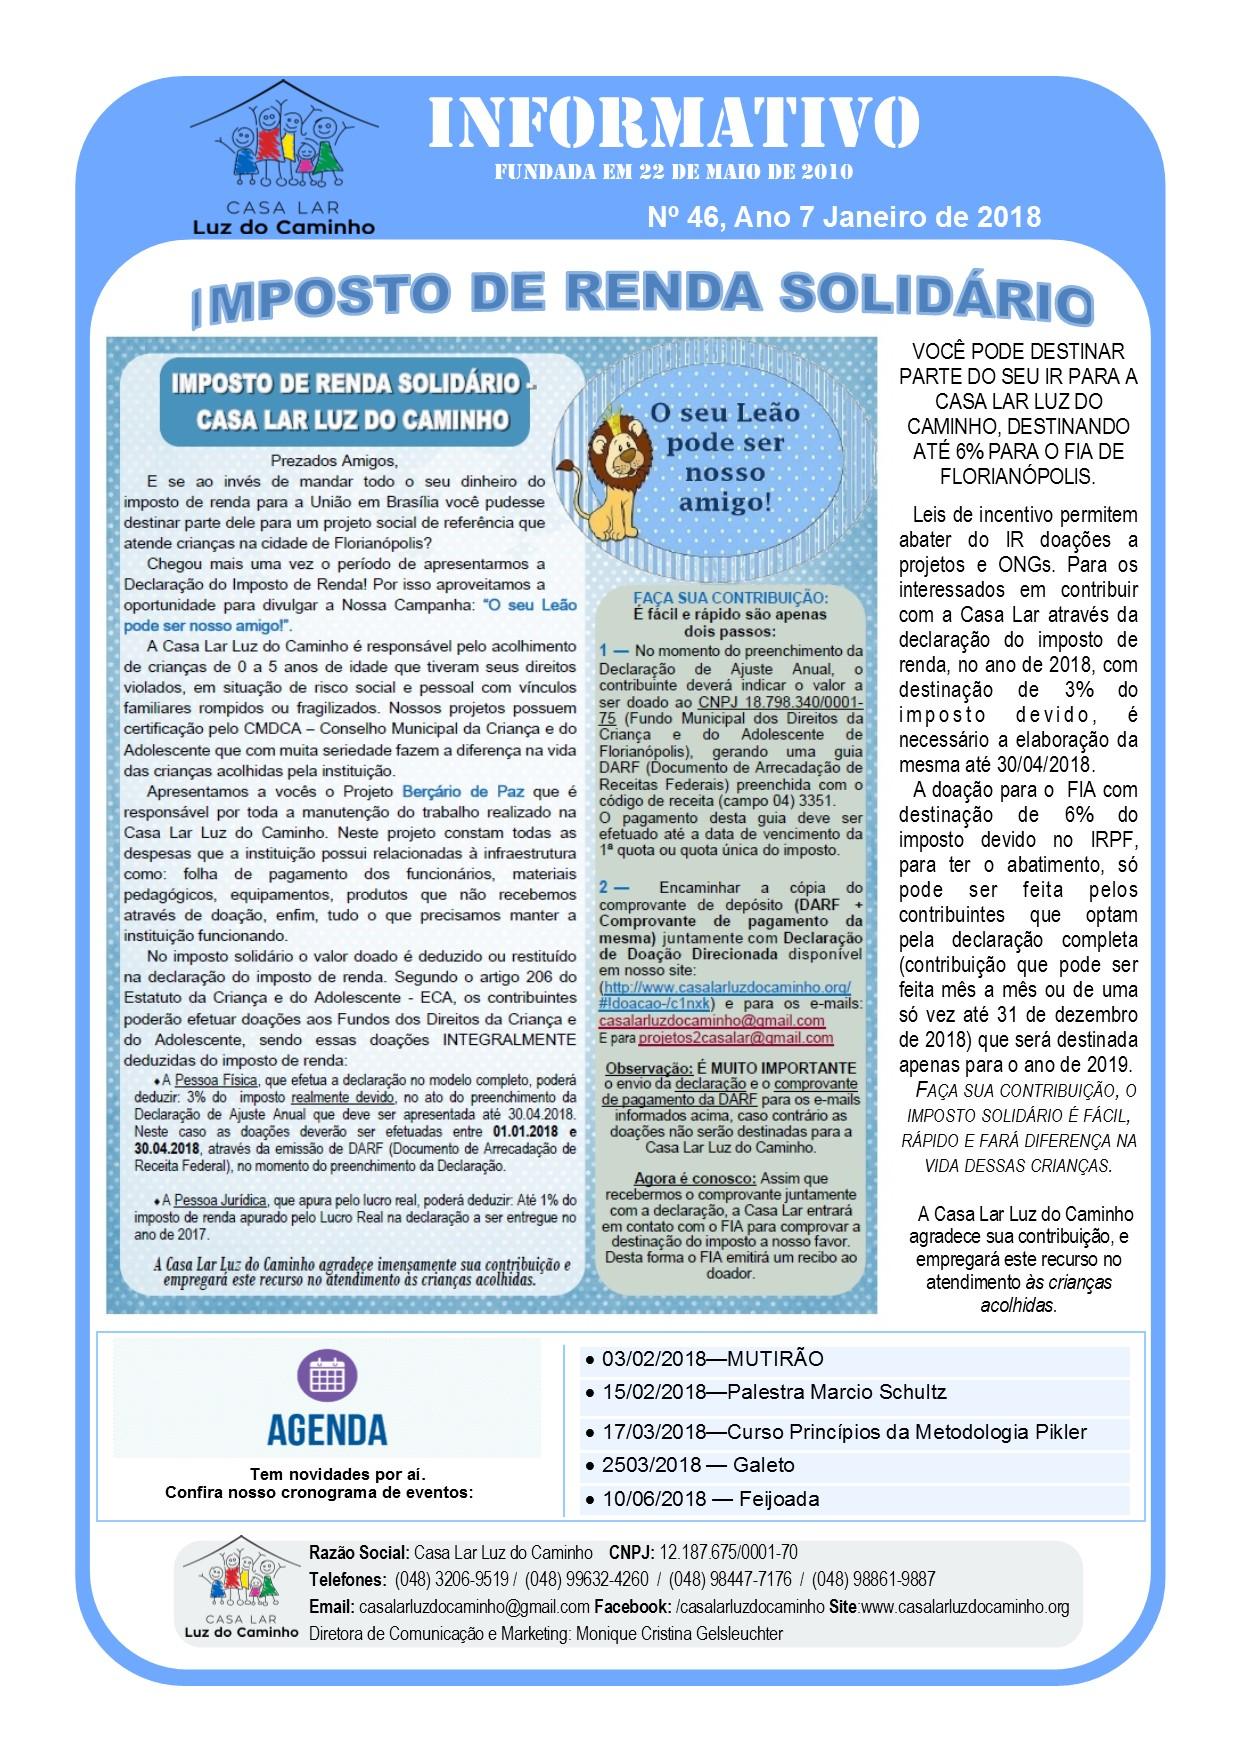 Informativo 01/18